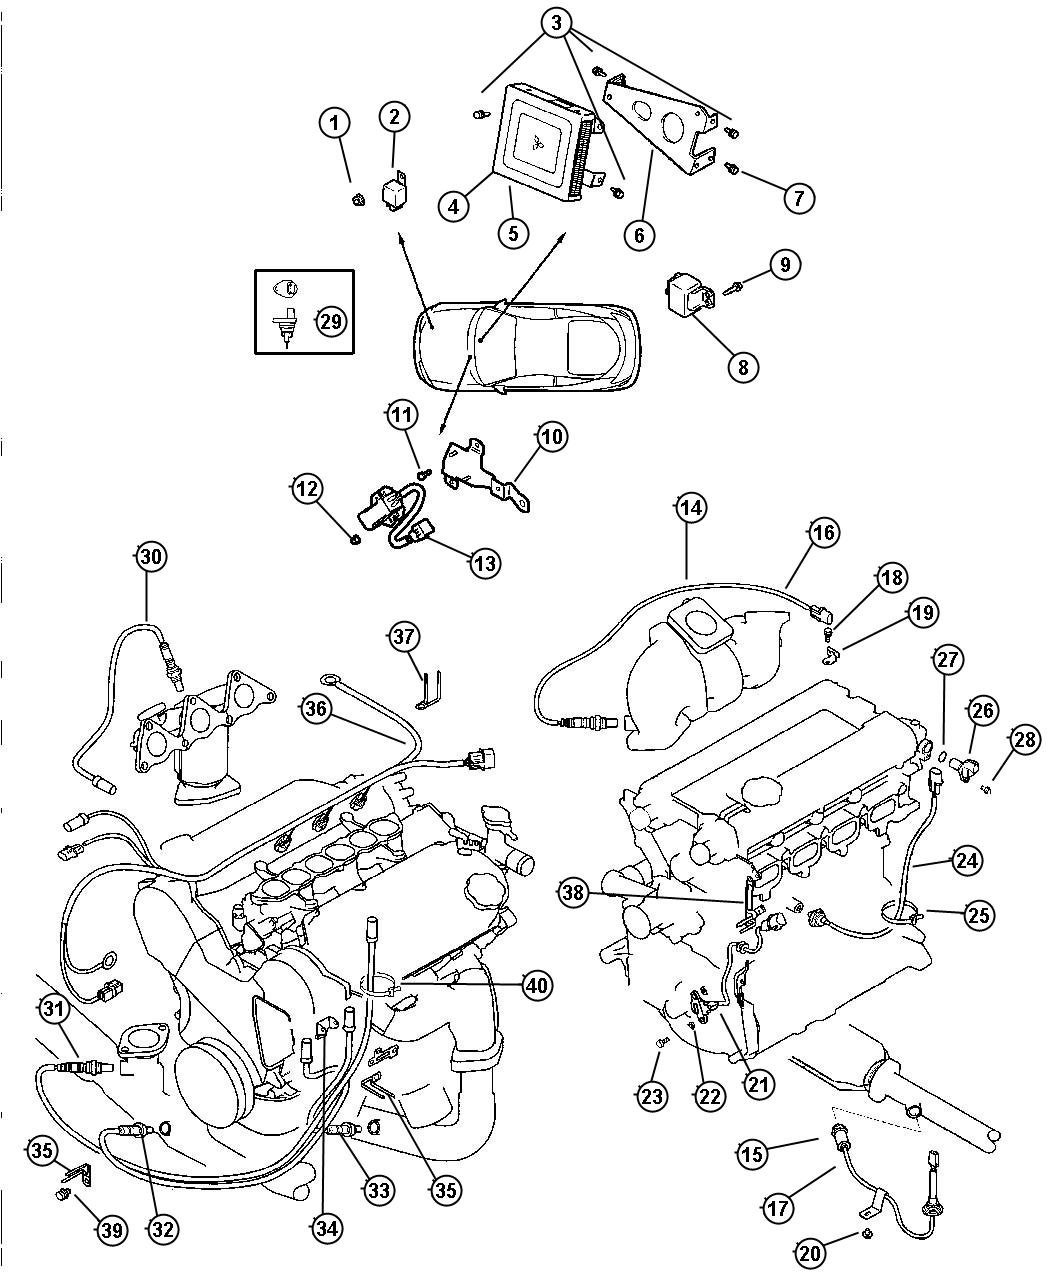 1991 Dodge Relay. Electrical. Alternator (g82-d-mk1